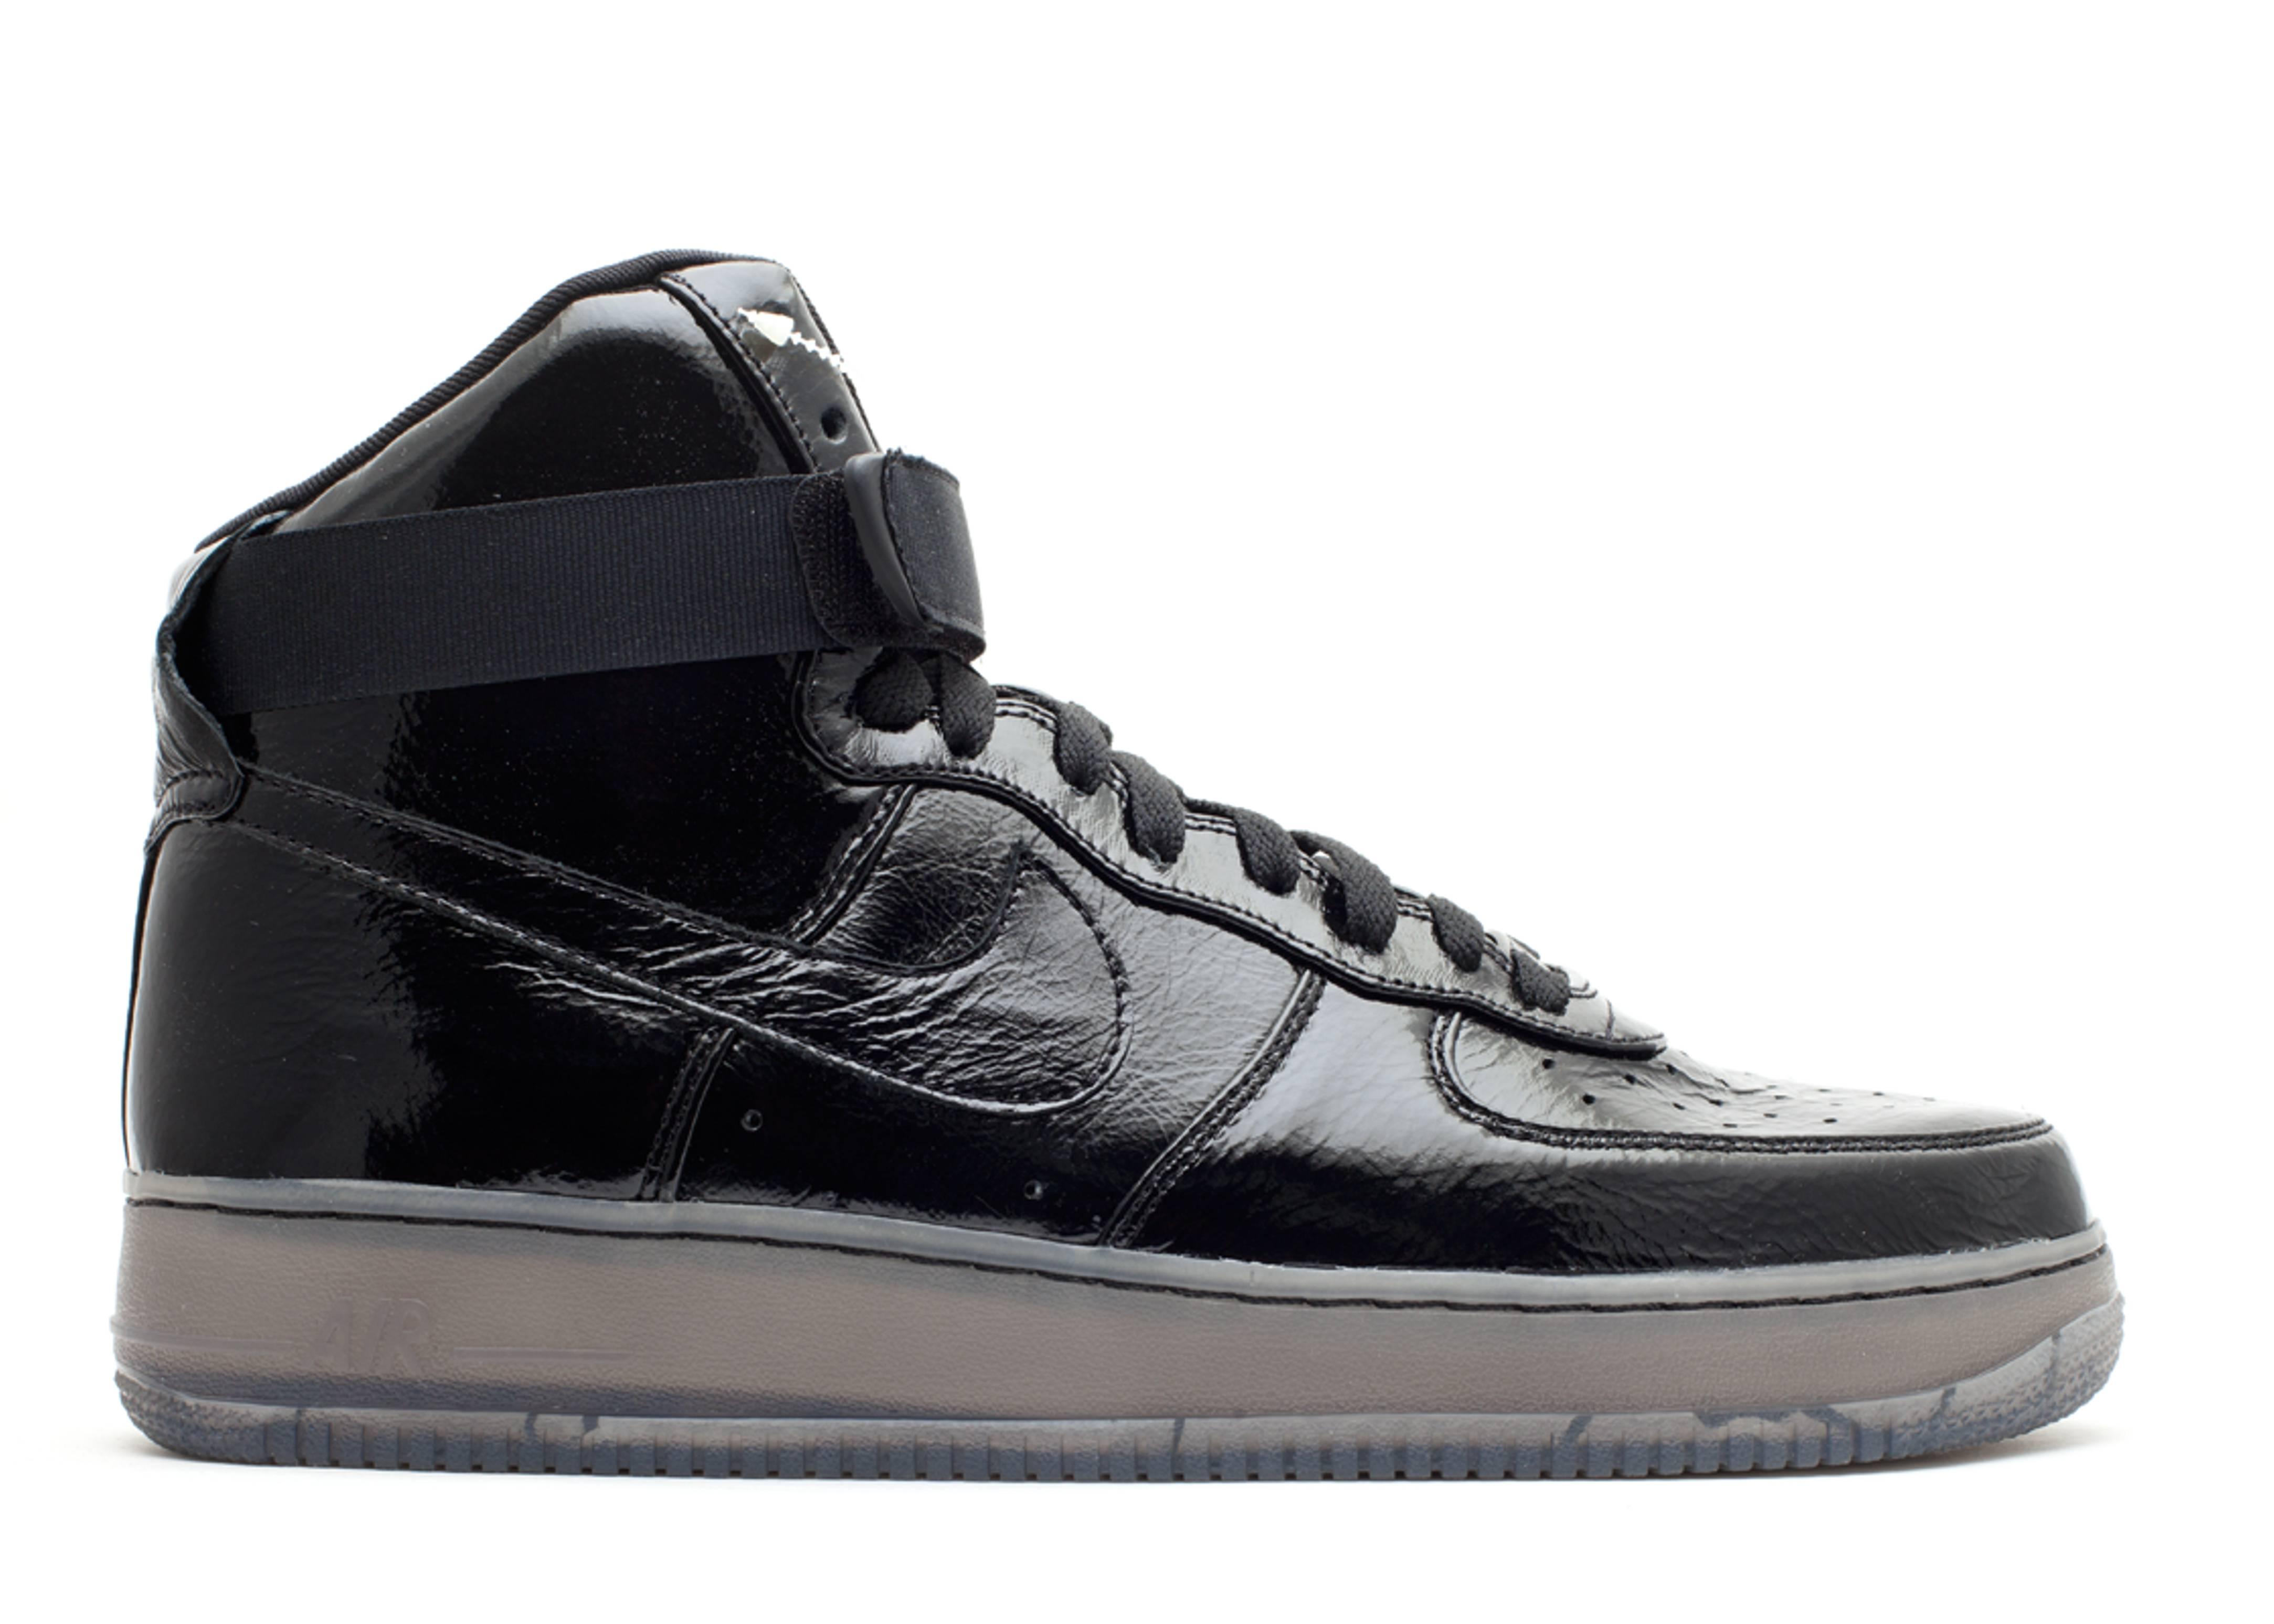 386161 Air 007 1 Blackblack Force Premium Le High Nike nwk0PO8X